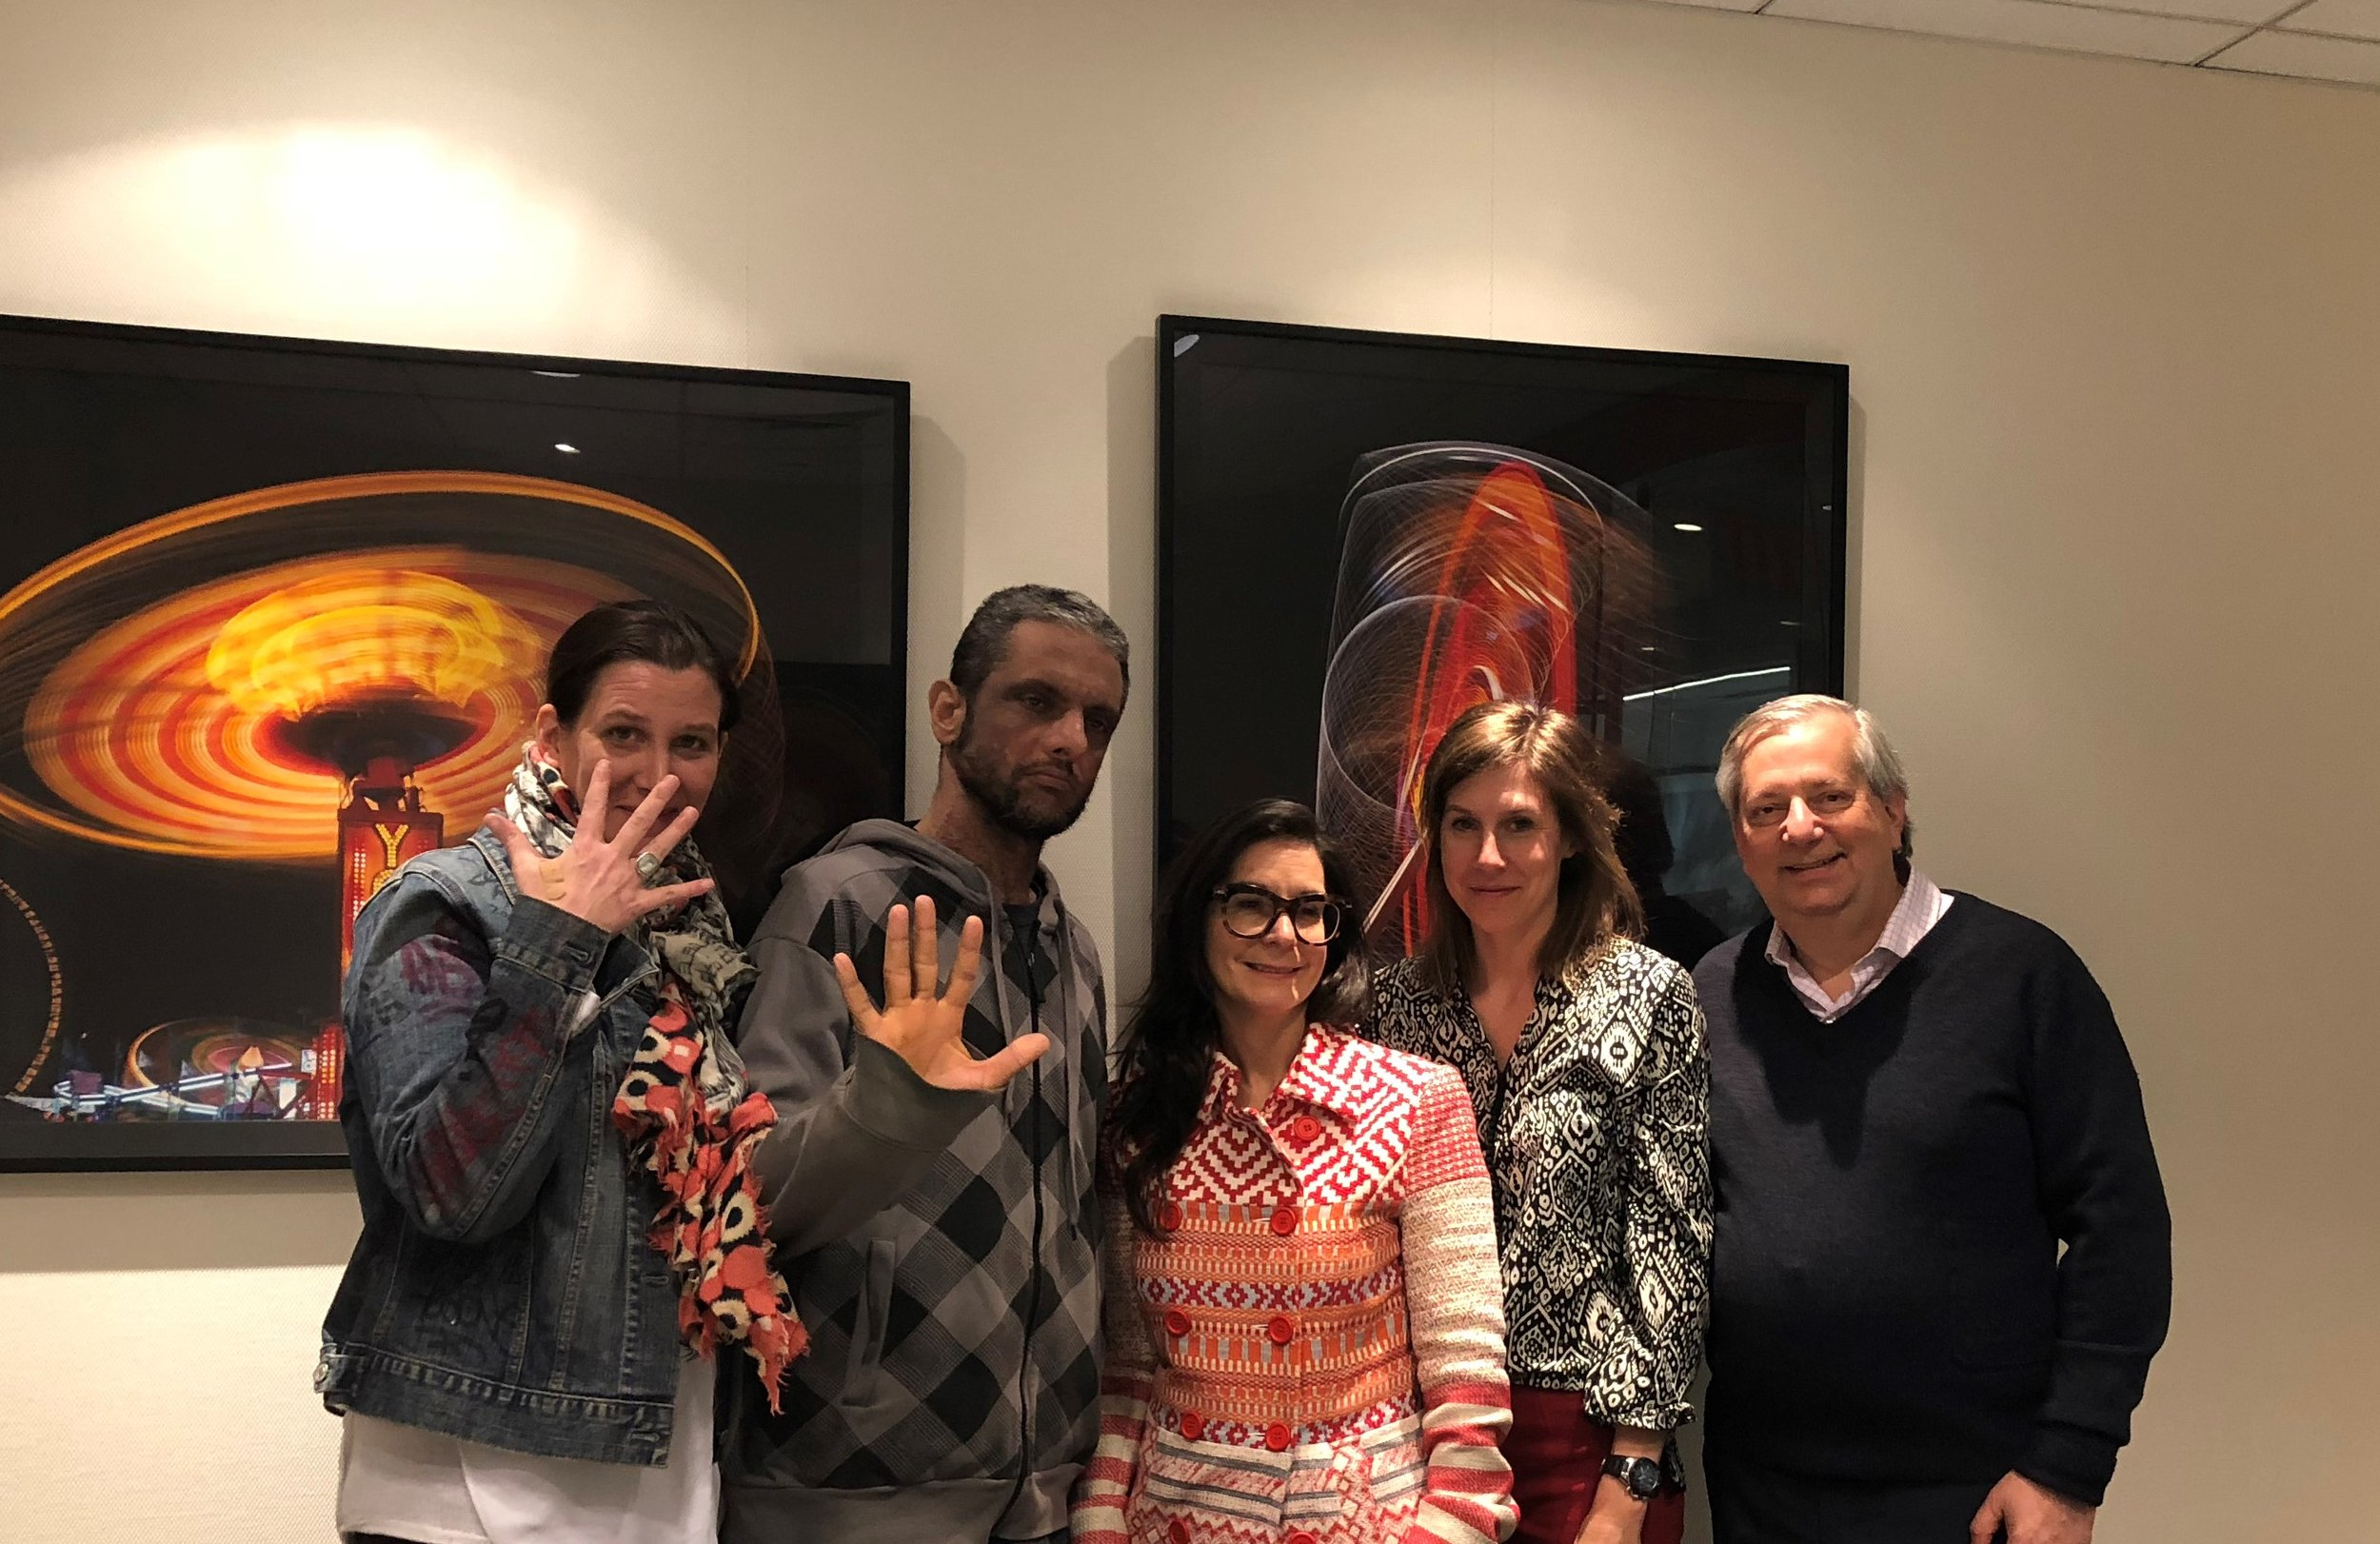 From left to right: Marie Cecile Flageul – Co-Founder/5Pointz Creates & Curator/MoSA, Jonathan Cohen (Meres One) – Founder/5Pointz & 5Pointz Creates, Renée Vara – Director/VARA ART, Katie Wilson-Milne Esq. - Partner/Schindler Cohen & Hochman LLP, & Steven Schindler Esq. - Partner/Schindler Cohen & Hochman LLP